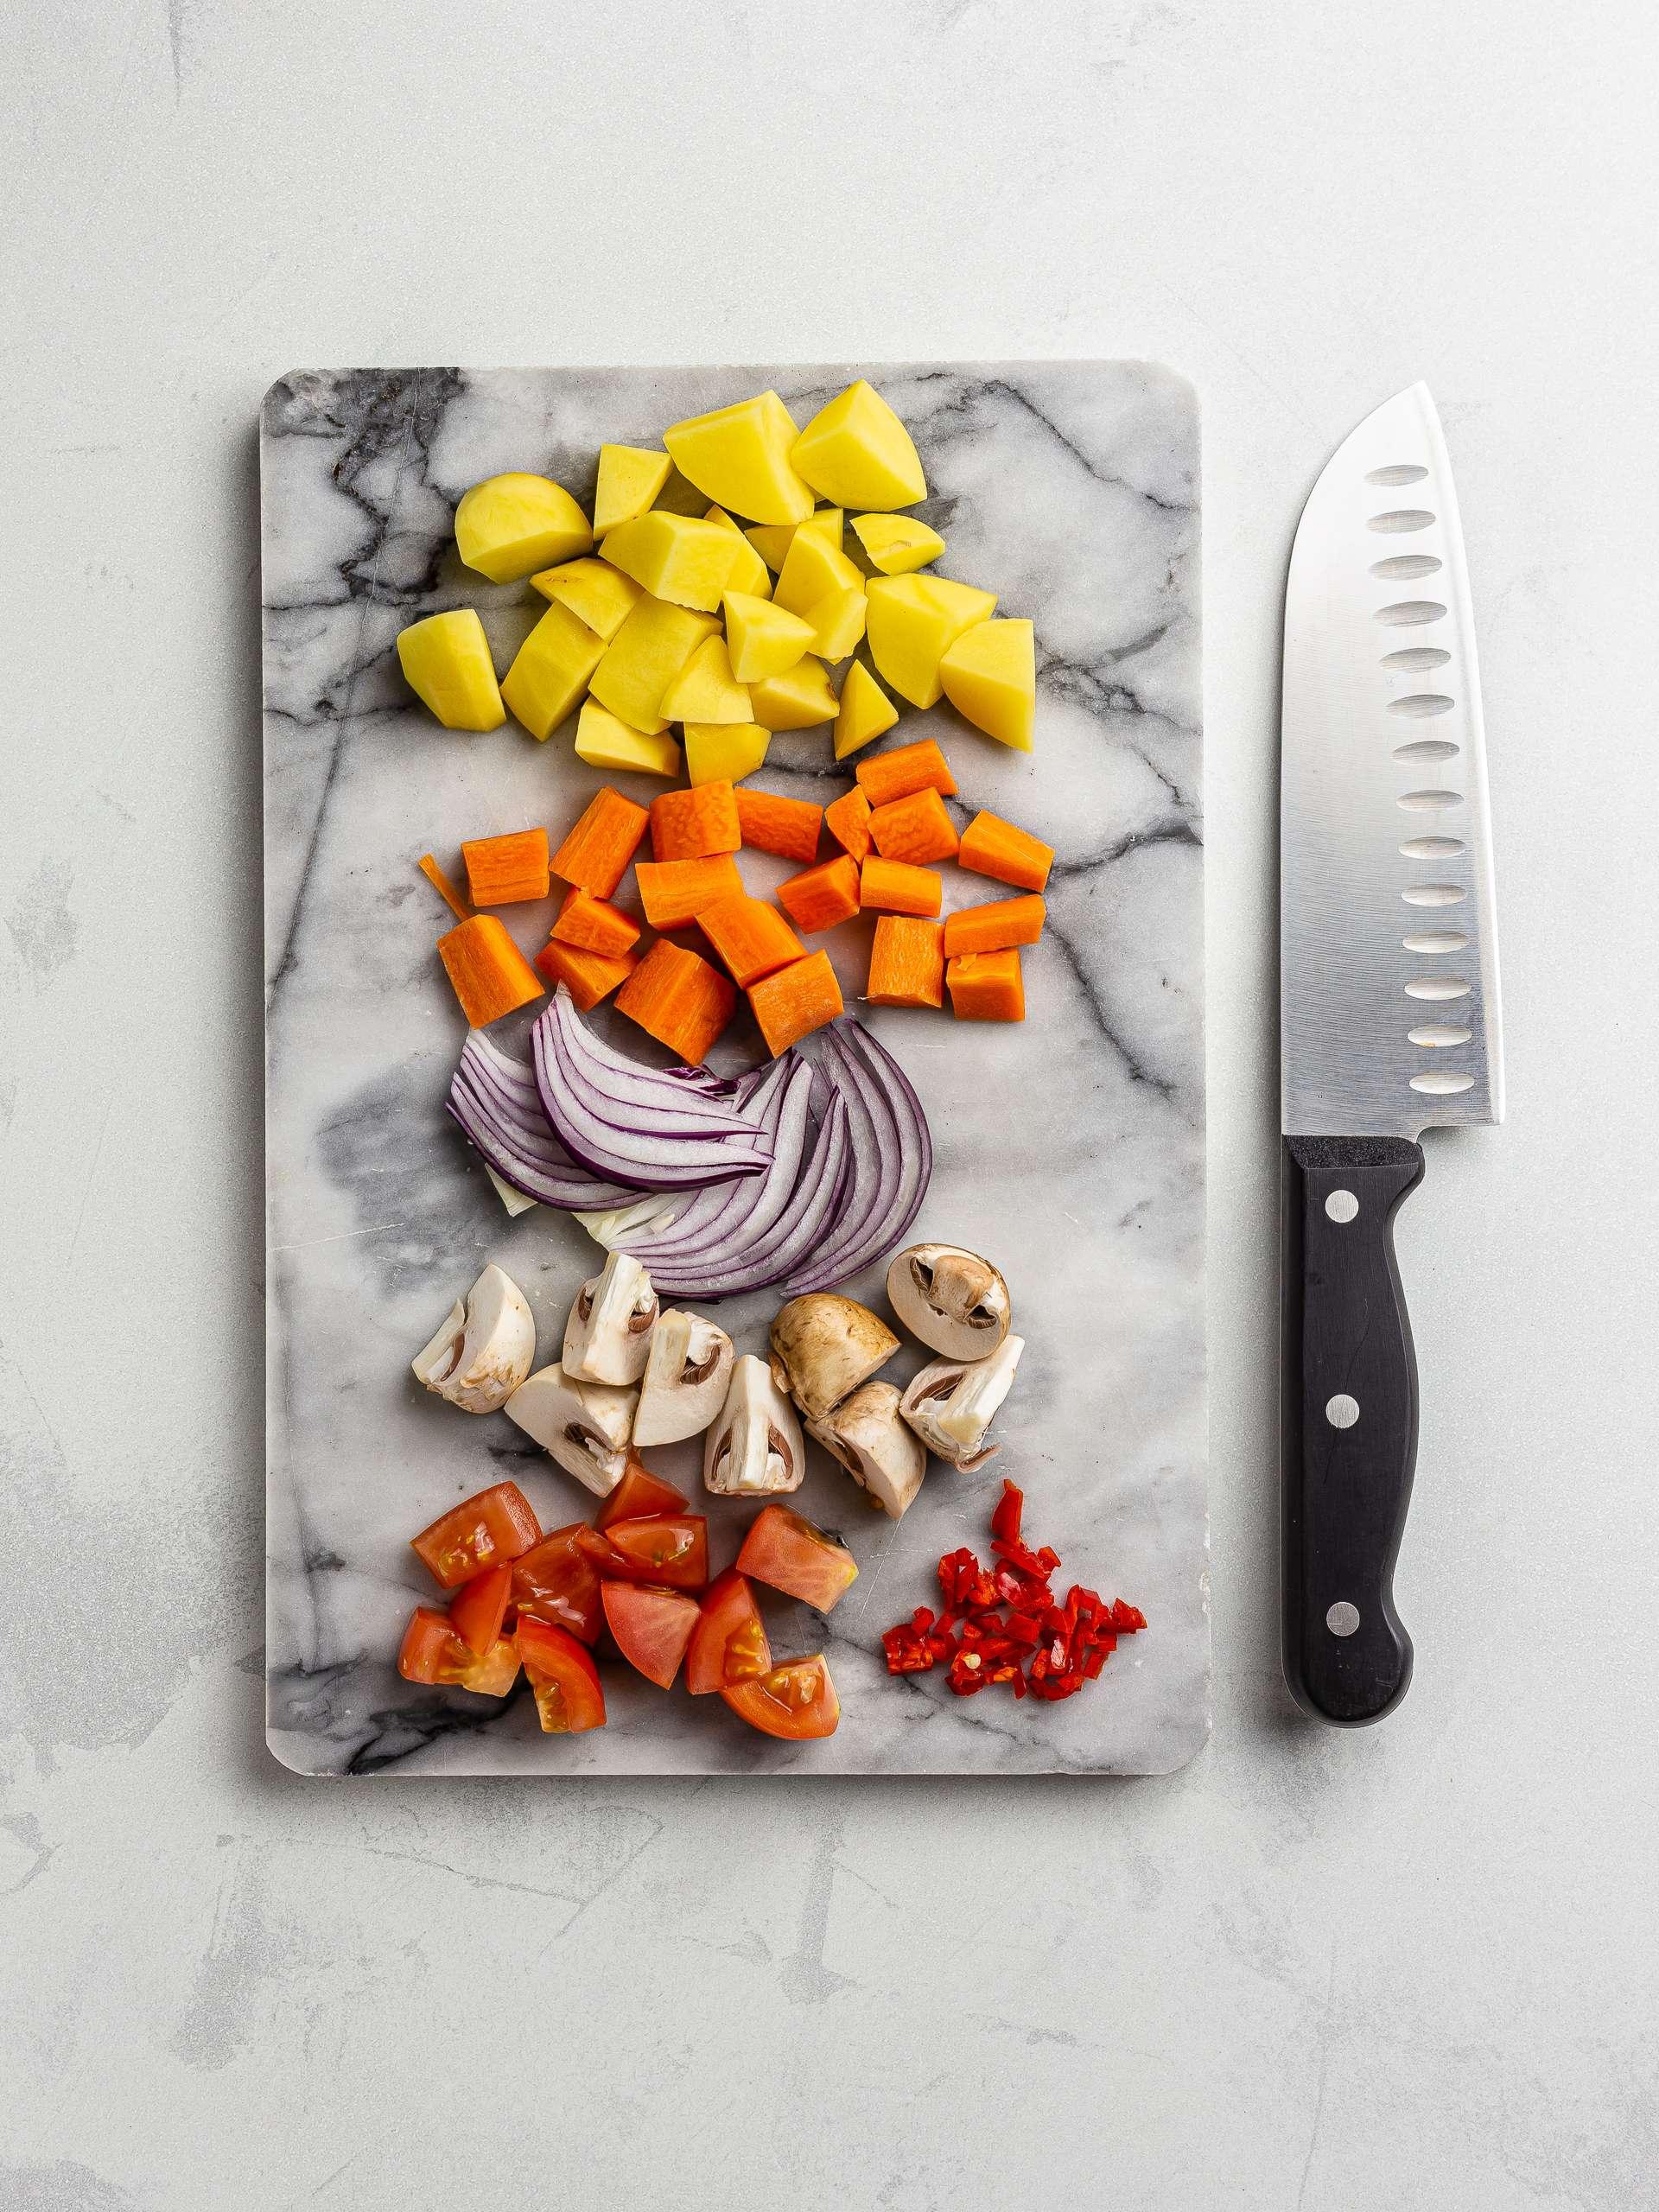 chopped vegetables for goulash